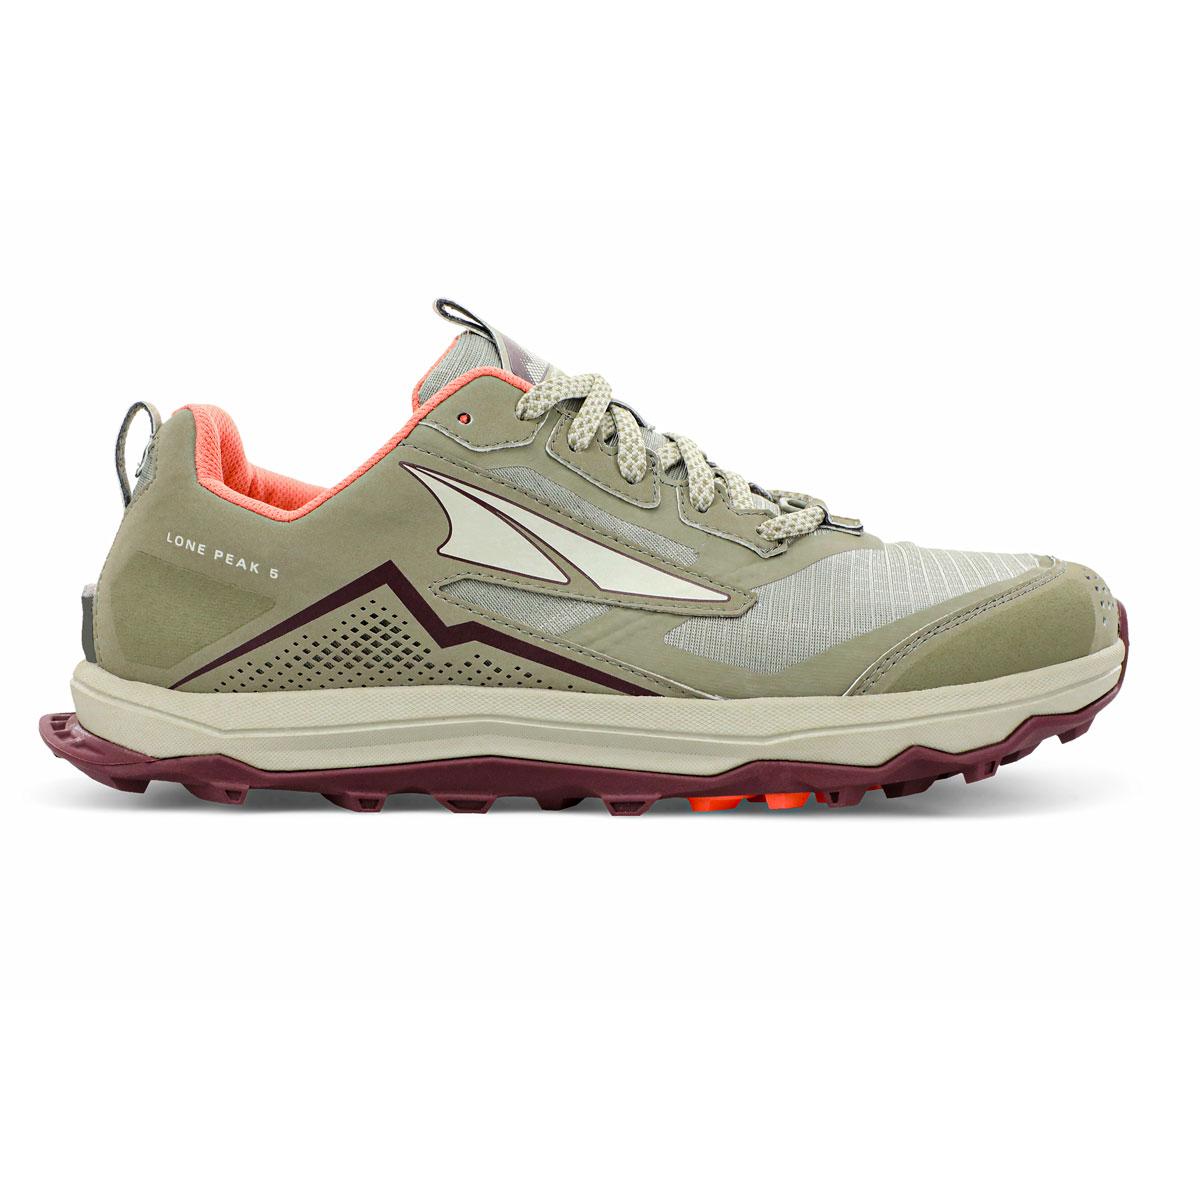 Women's Altra Lone Peak 5 Trail Running Shoe - Color: Khaki - Size: 5.5 - Width: Regular, Khaki, large, image 1